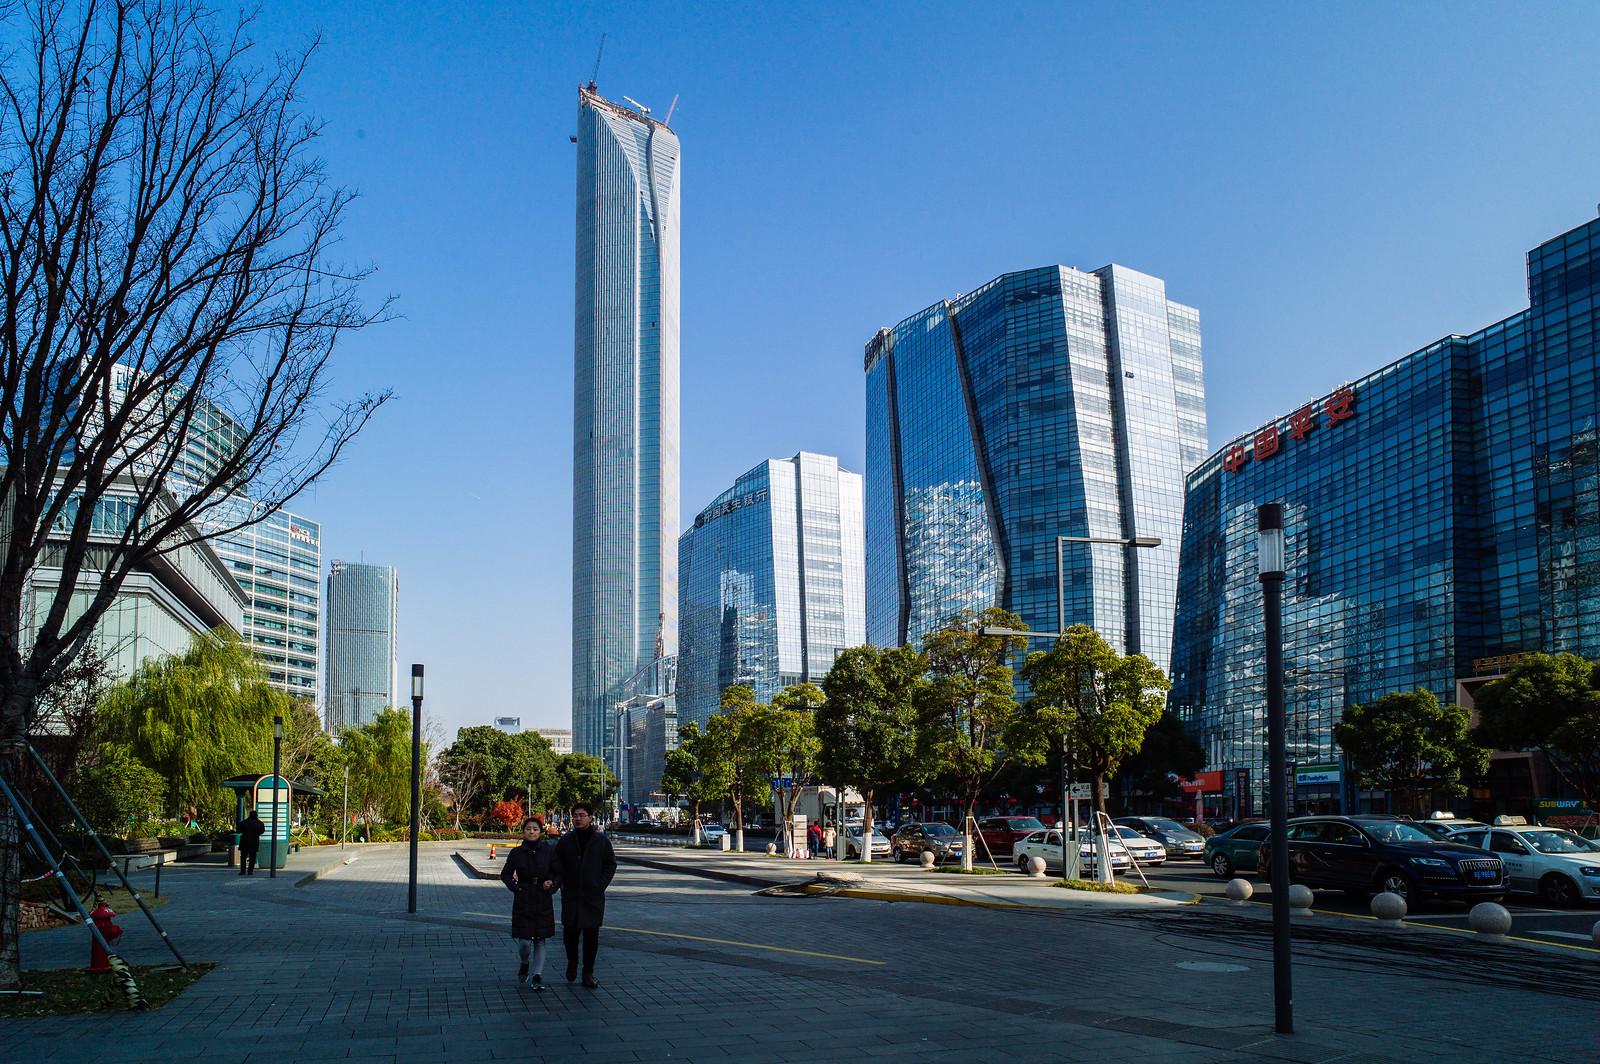 SUZHOU | Suzhou IFS | 450m | 1476ft | 98 fl | Com | Page 27 | SkyscraperCity